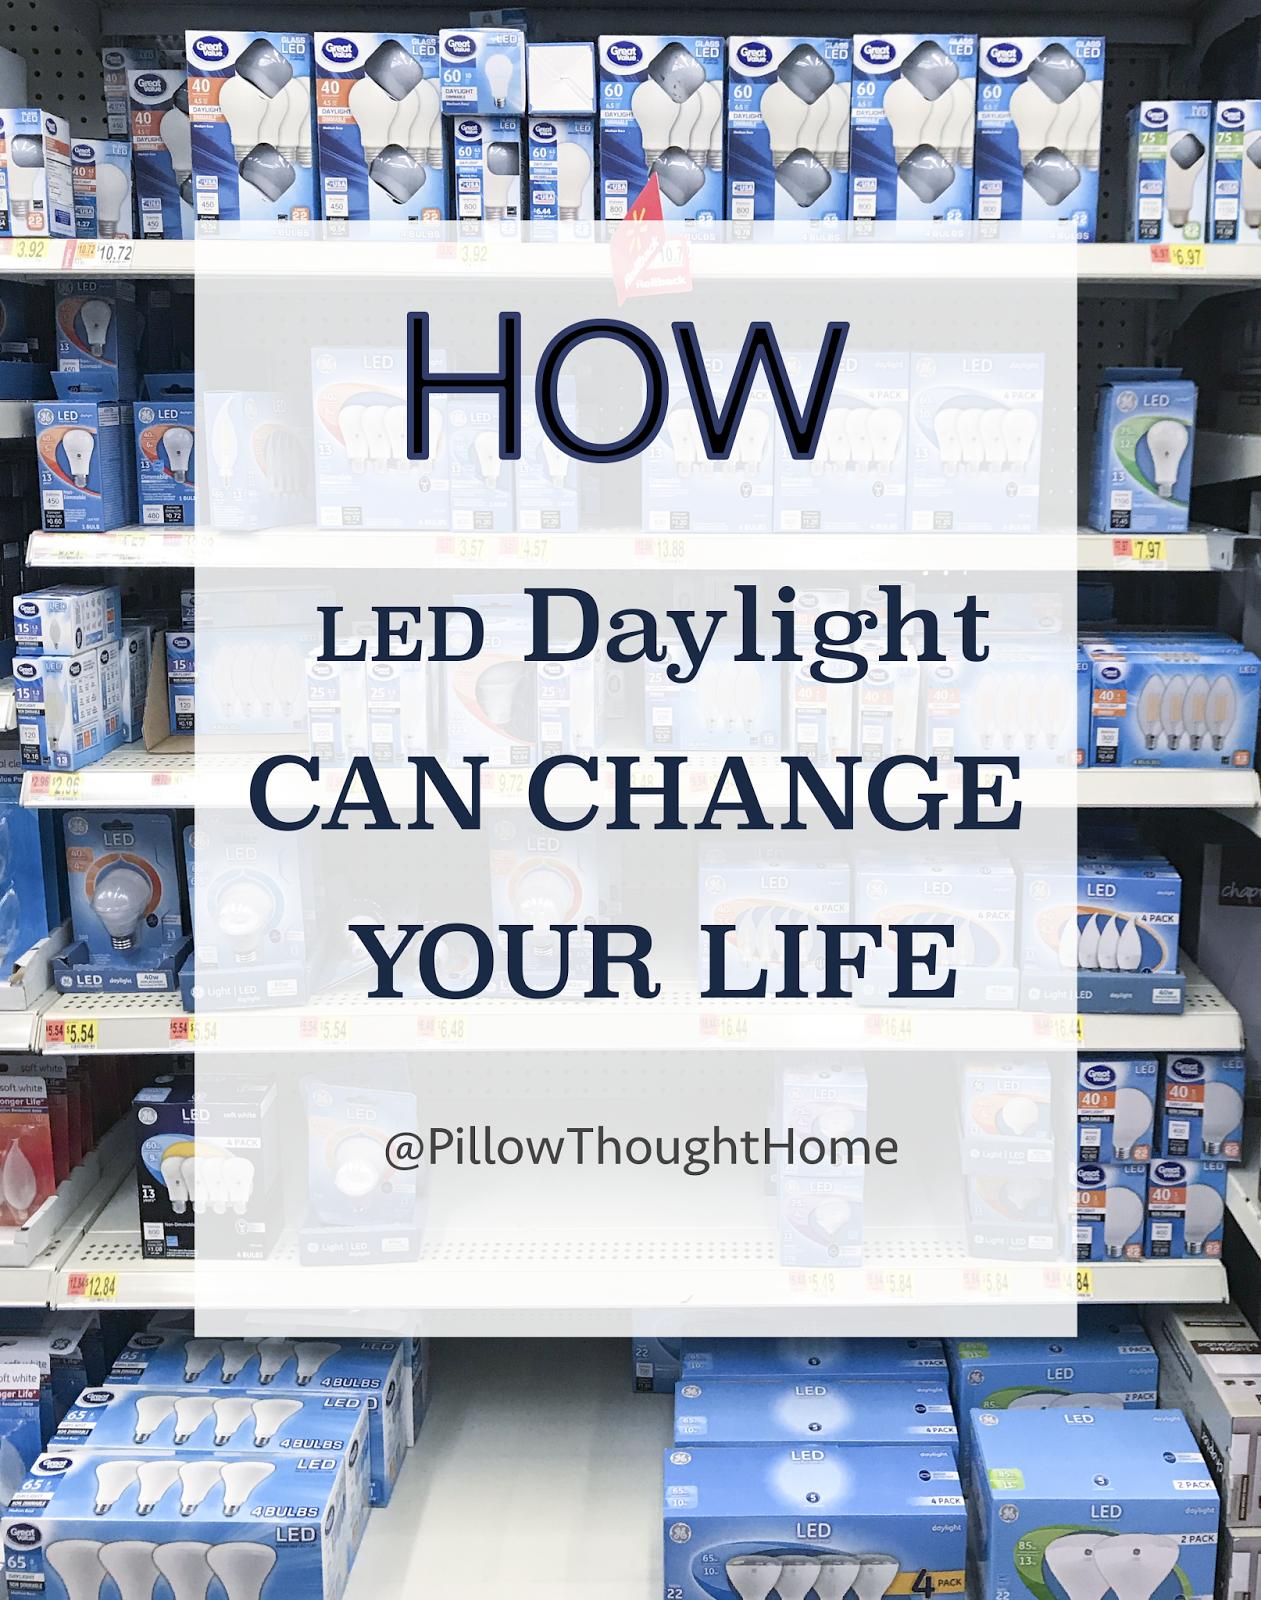 Led Daylight Lightbulbs Led Down Lights Daylight Bulbs Light Box Diy